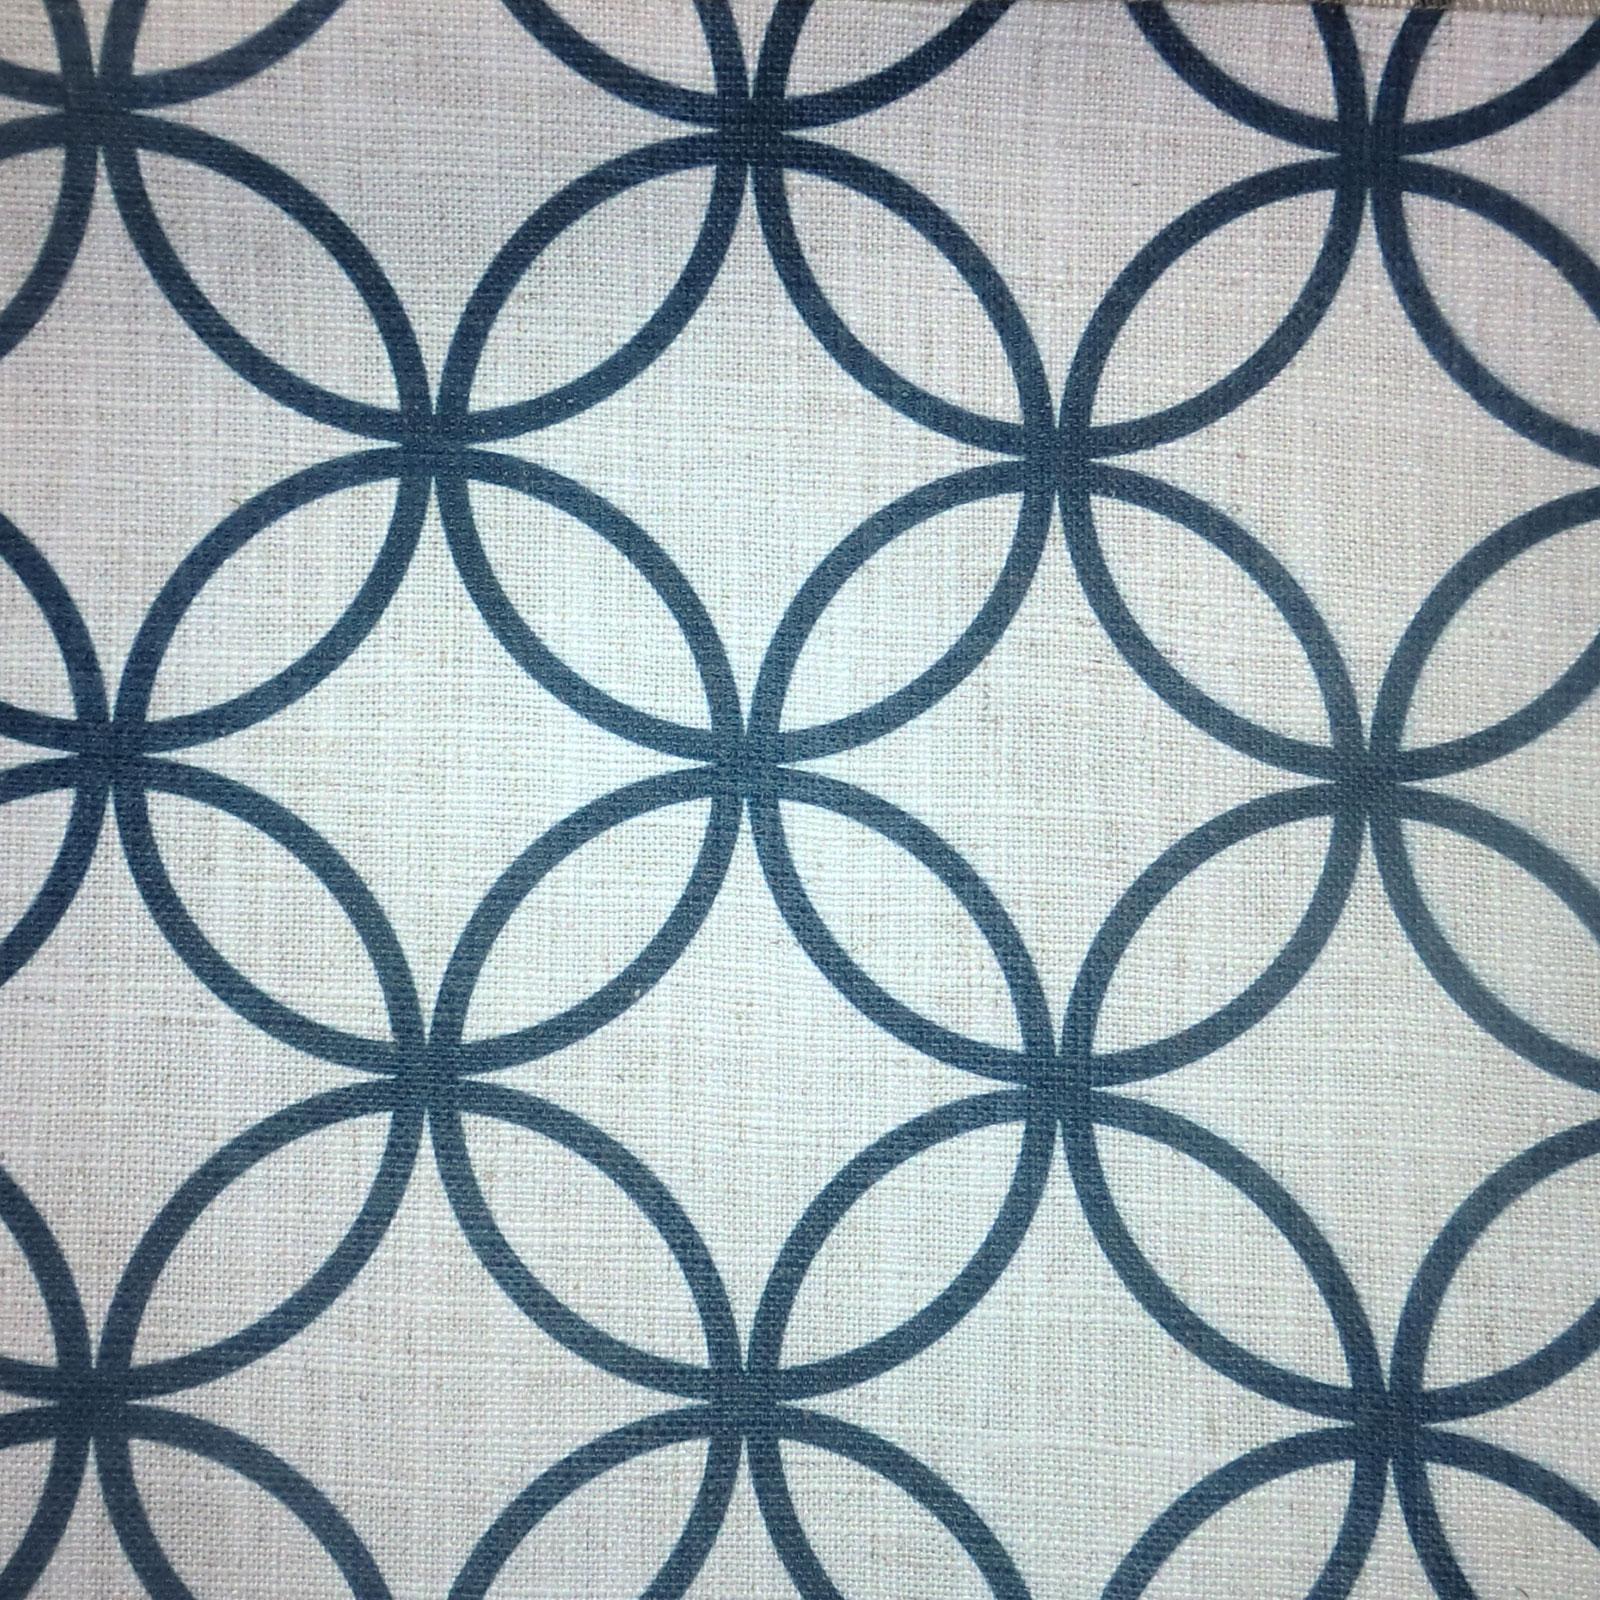 Magnolia Fabrics Pooka Naval 1600x1600